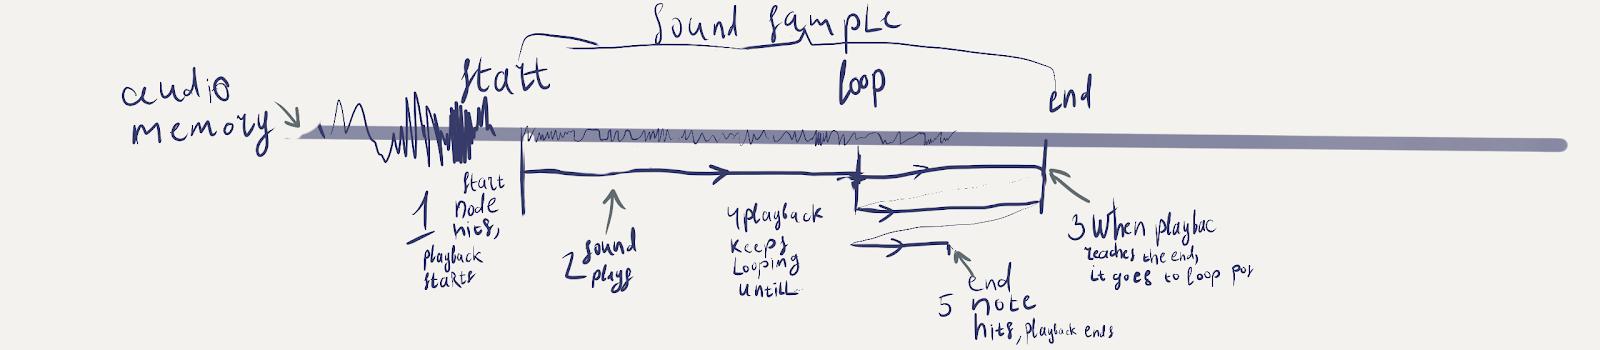 Sound device controlled via lua - Idea Box - Dual Universe